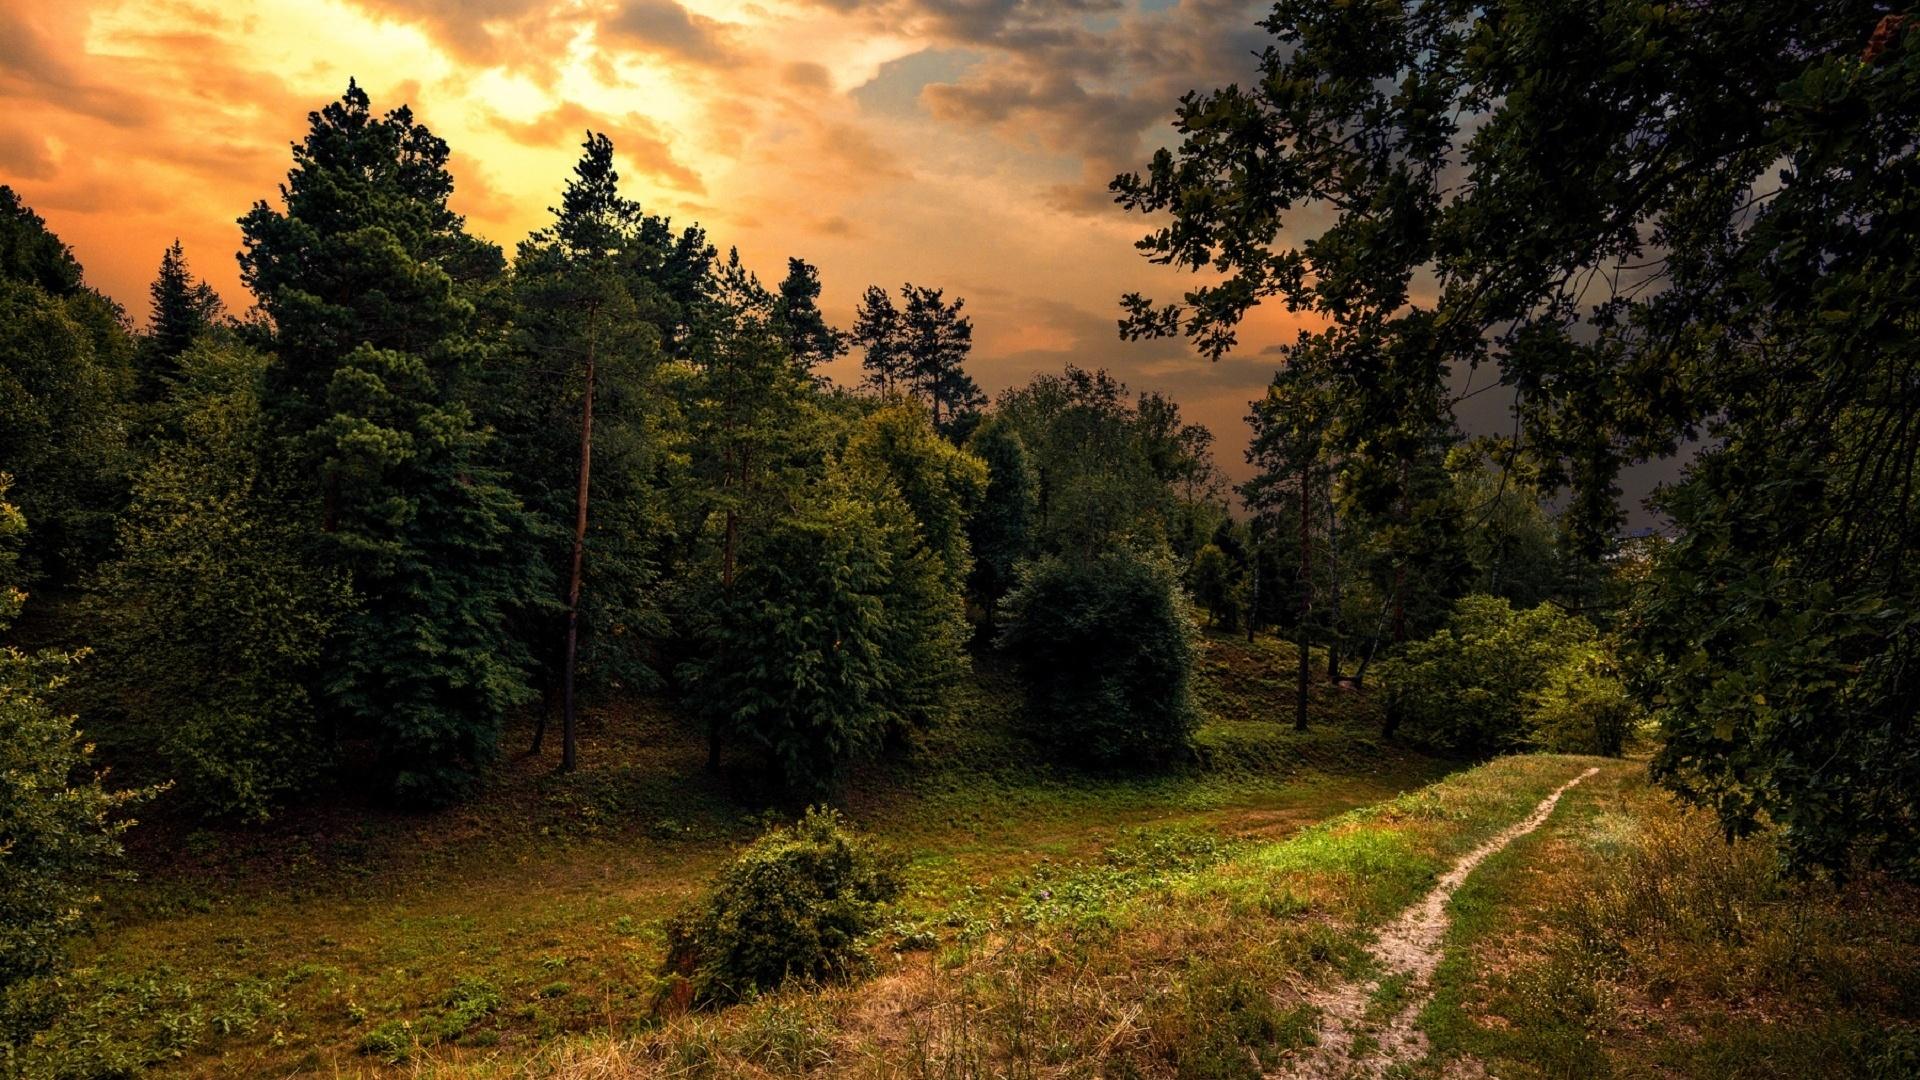 закат тропинка речка картинки близкого расположения печки